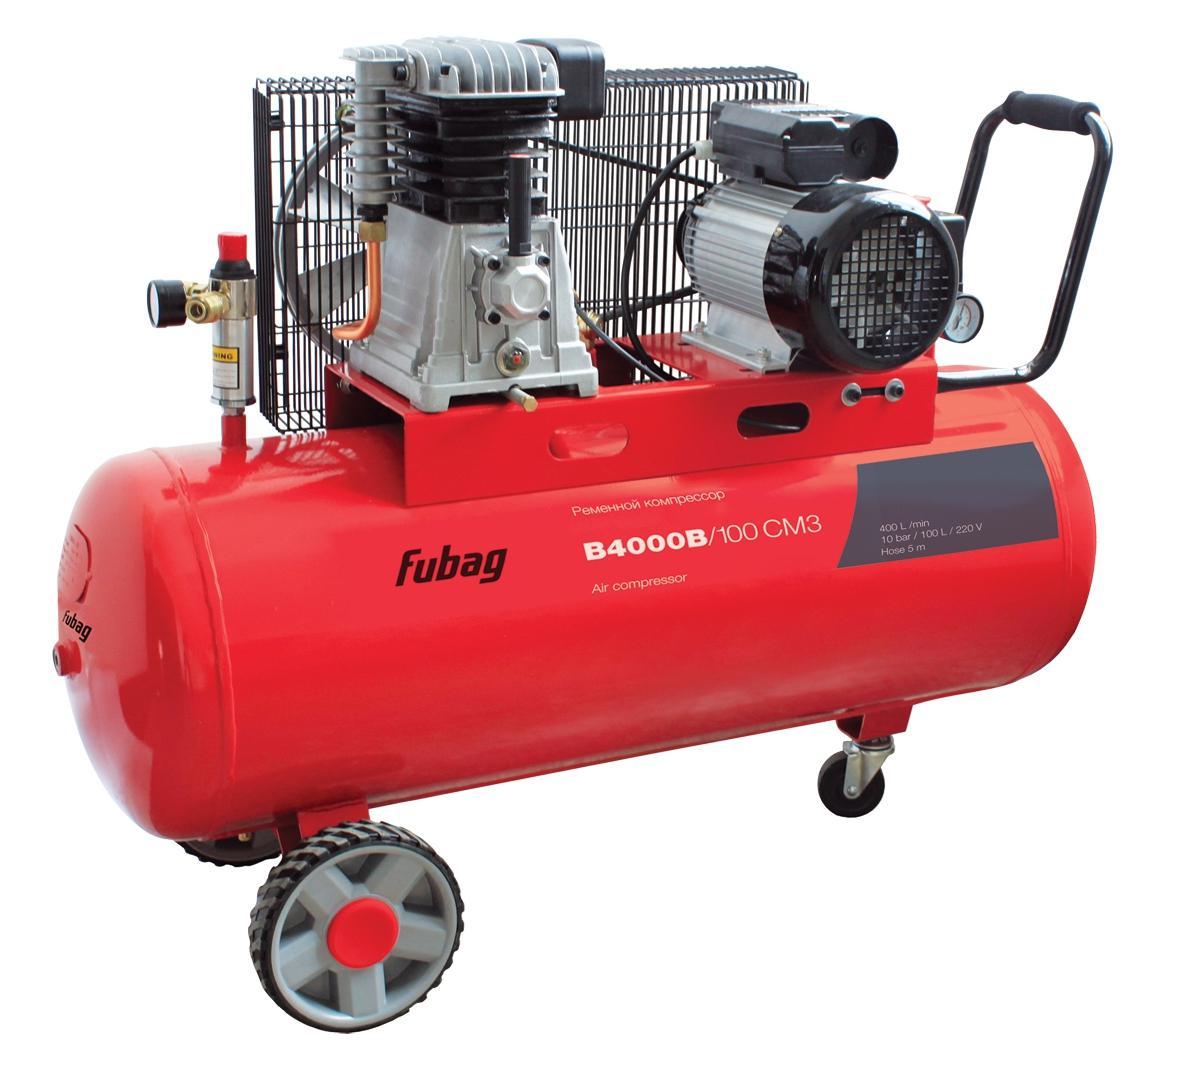 Компрессор Fubag B4000b/100 СМ3 компрессор fubag b4000b 100 см3 45681496